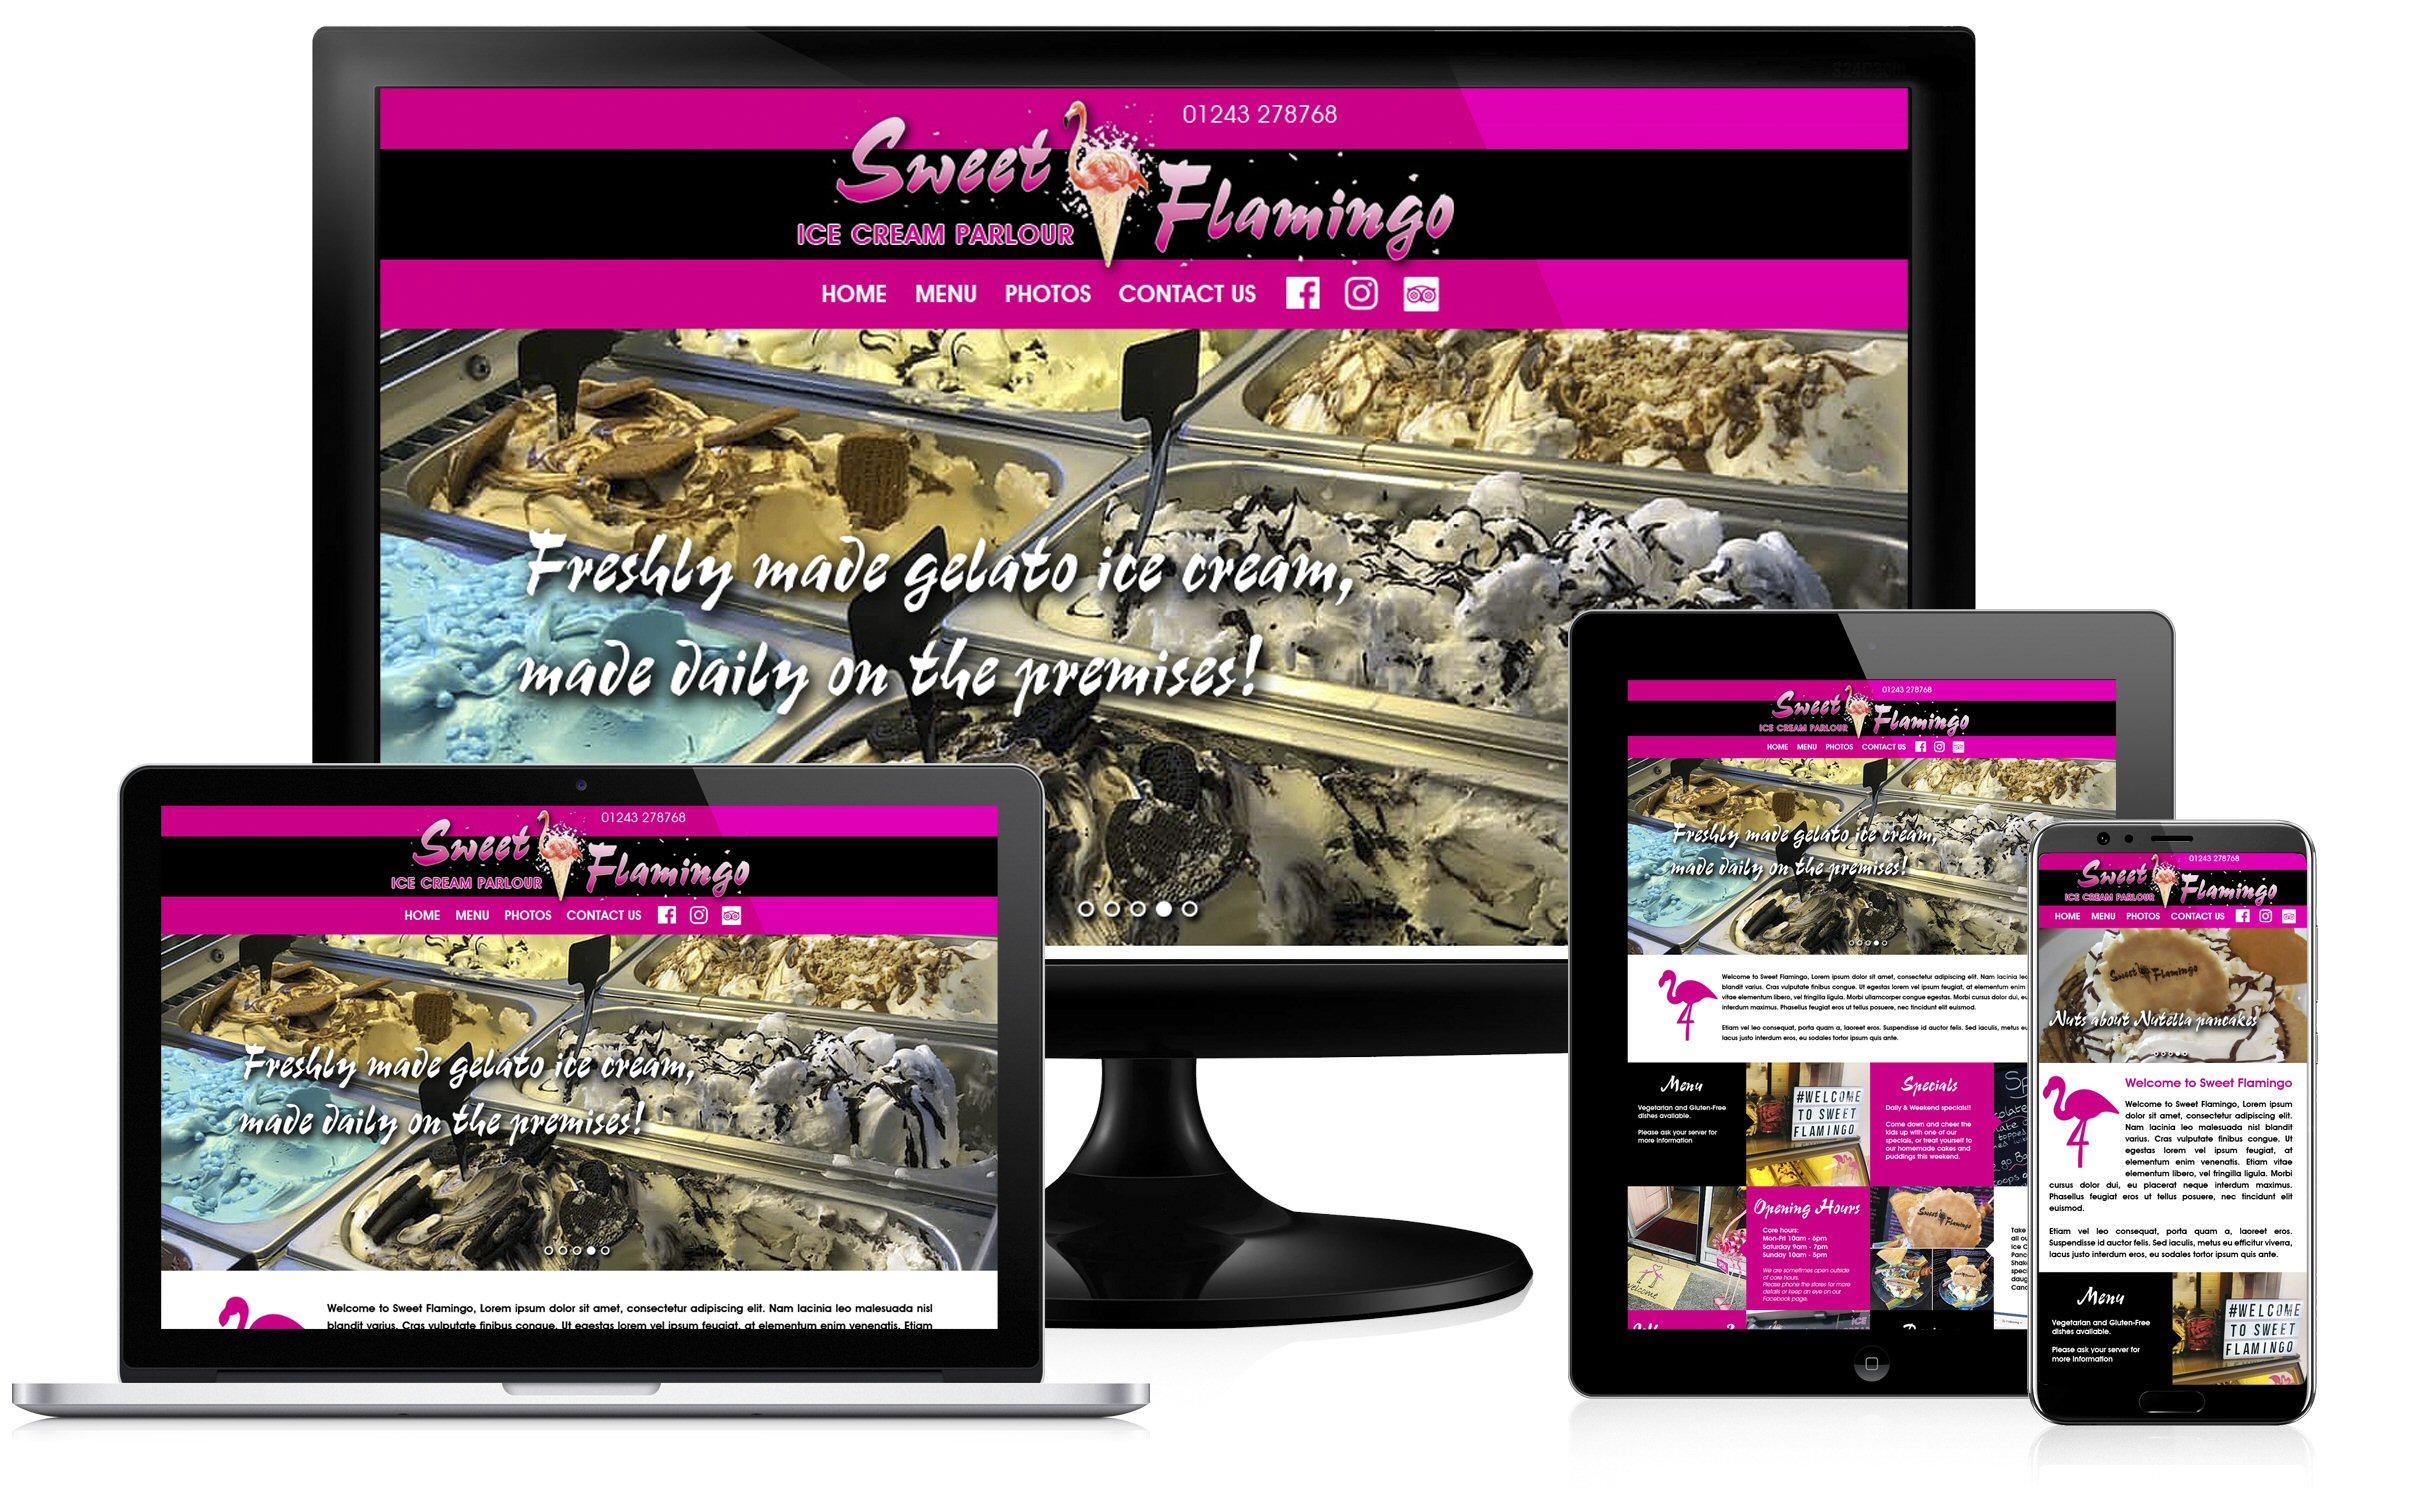 Sweet Flamingo website image block